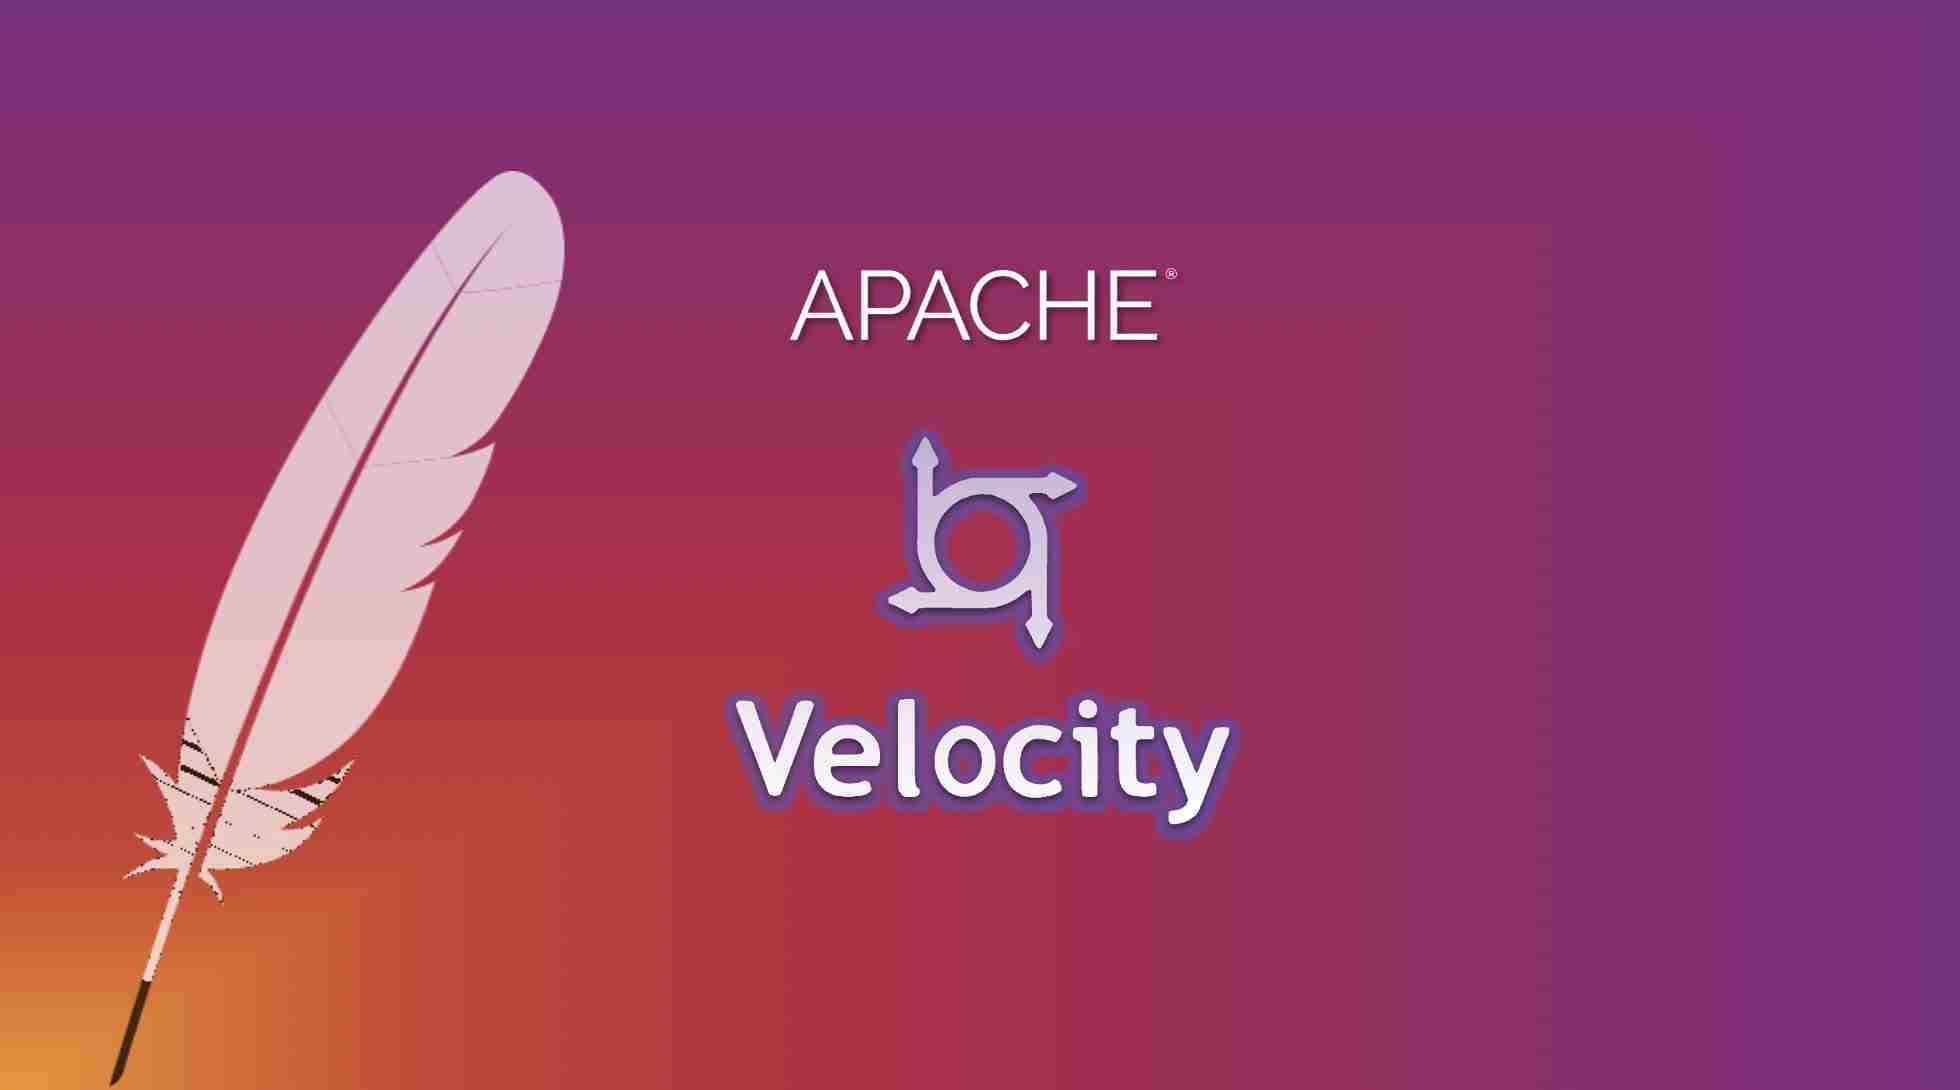 Undisclosed Apache Velocity XSS Vulnerability Impacts GOV Sites